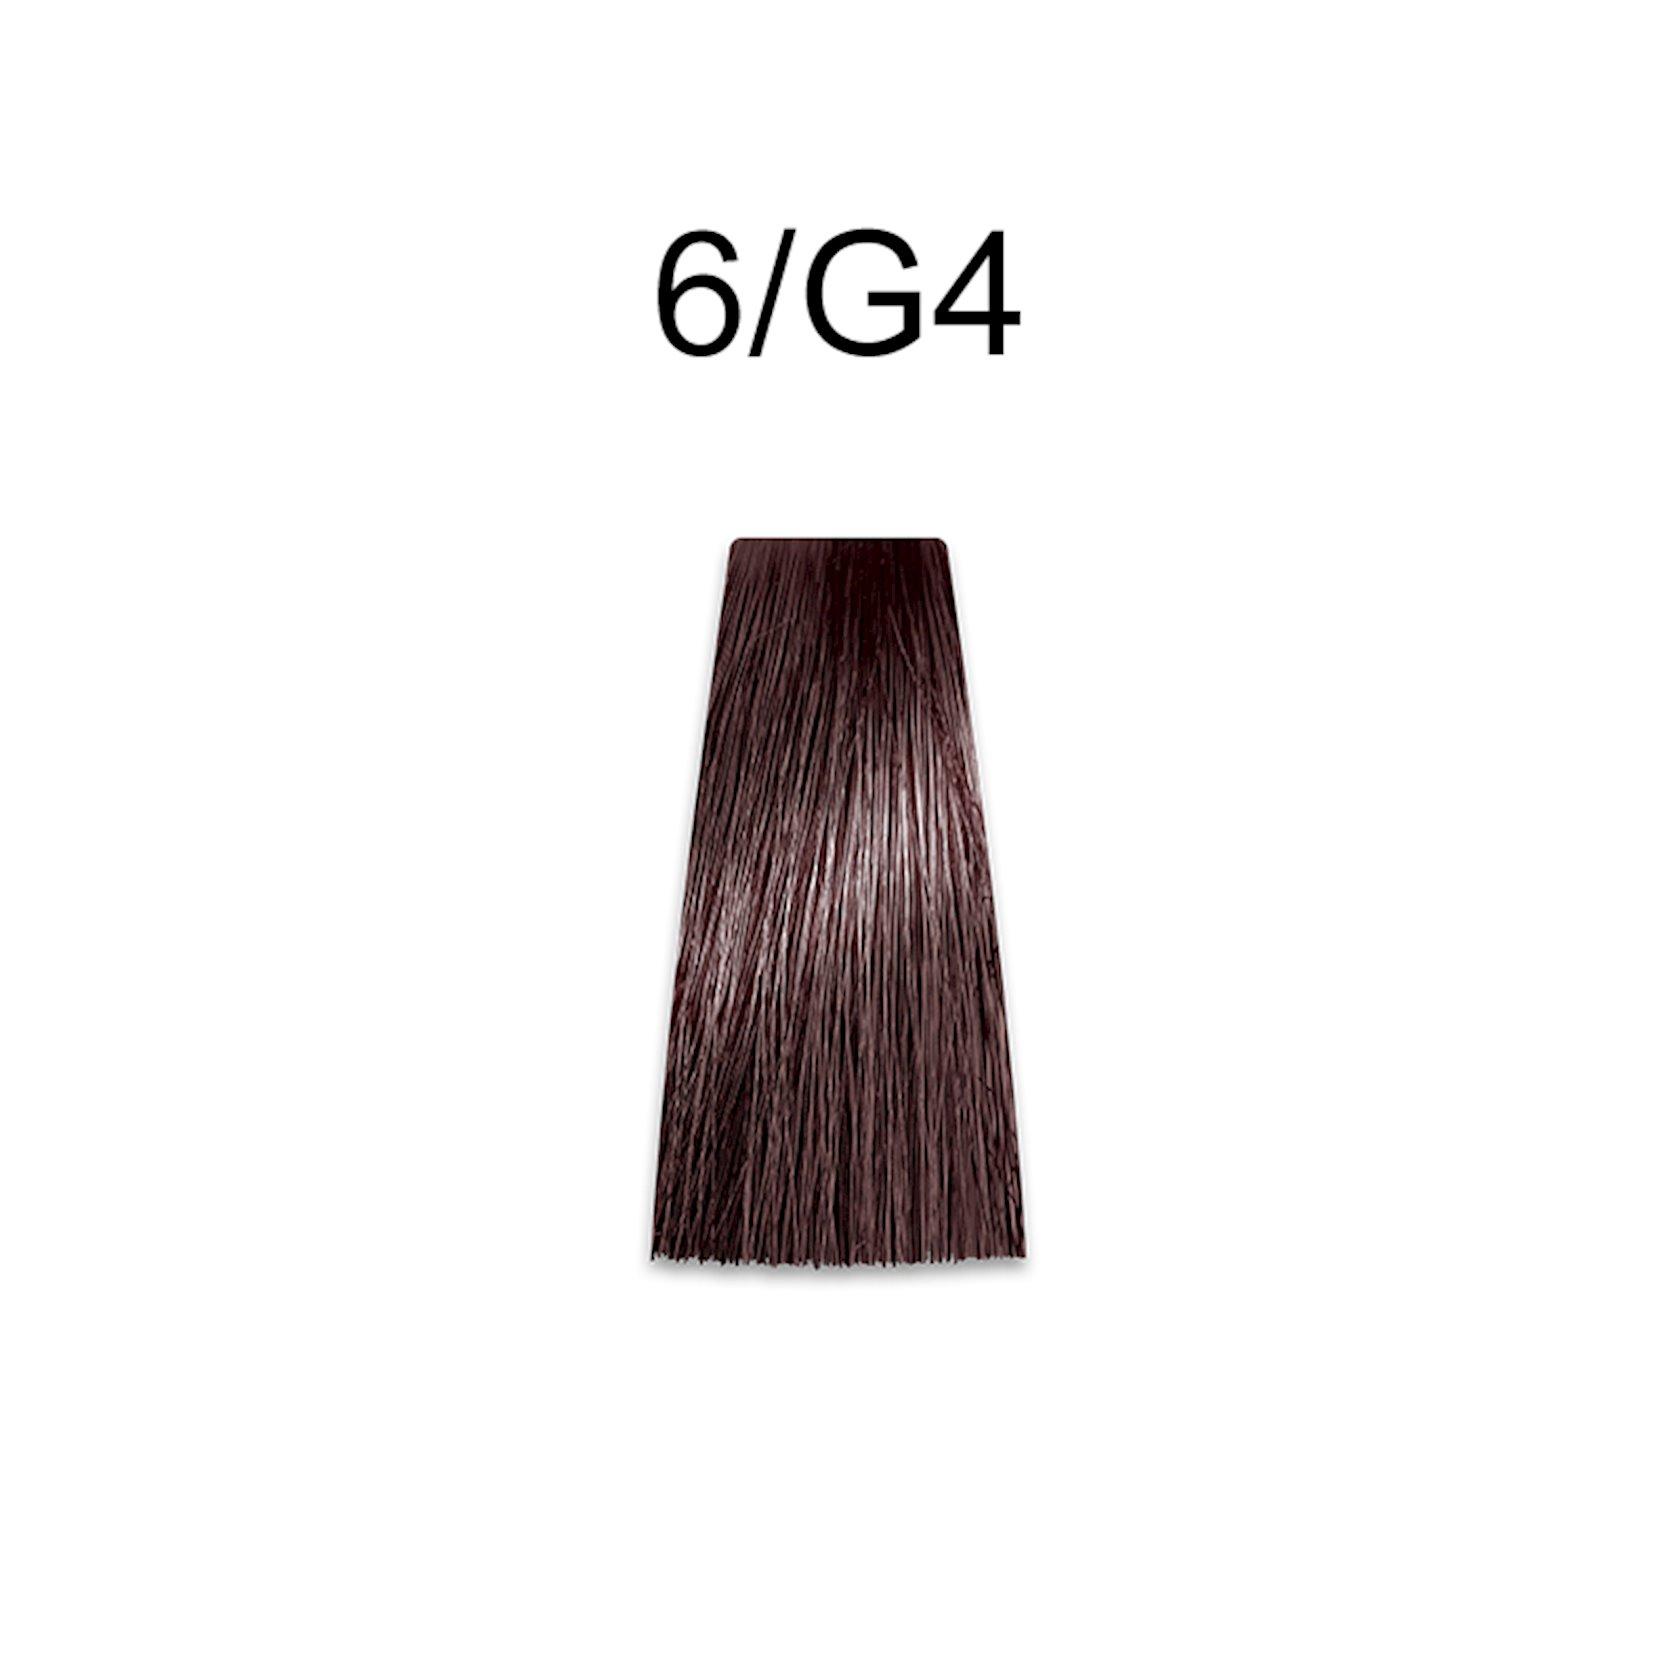 Saçlar üçün krem-boya Prosalon Professional Intensis Color Art № 6-G4 tobacco dark blond 100 ml